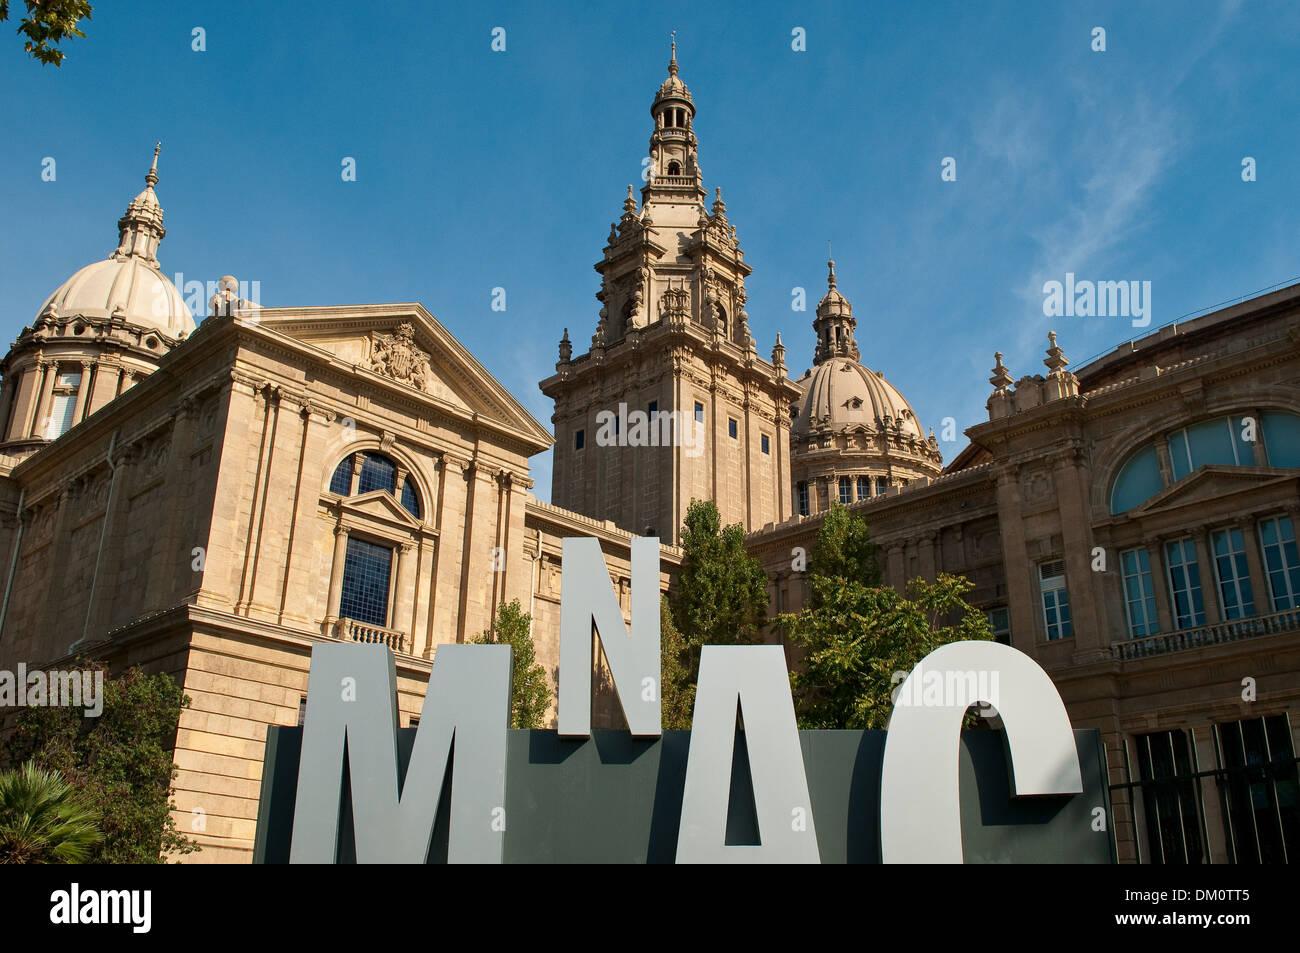 National Art Museum of Catalonia, MNAC, Barcelona, Catalonia, Spain - Stock Image